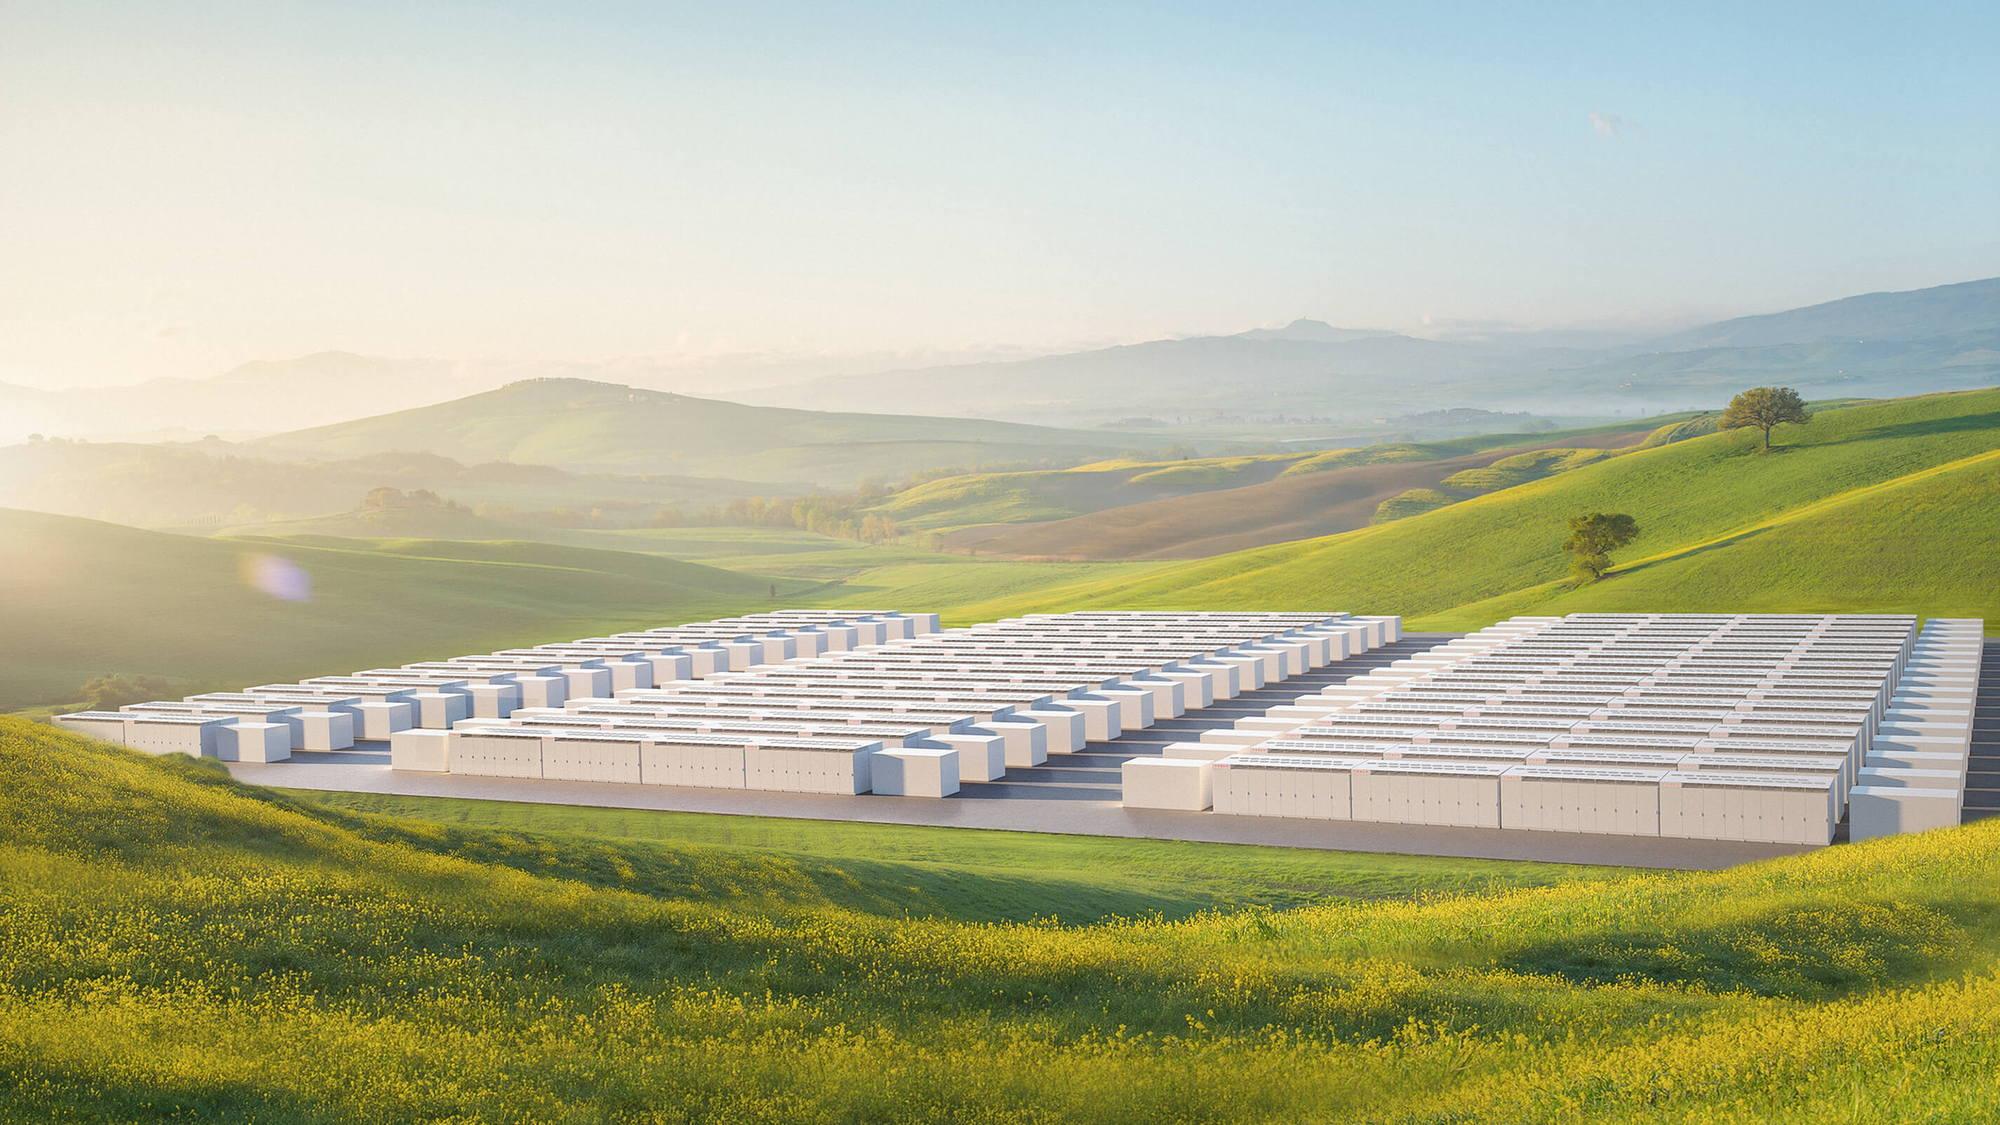 Artist's rendering of Tesla Megapack grid storage installation